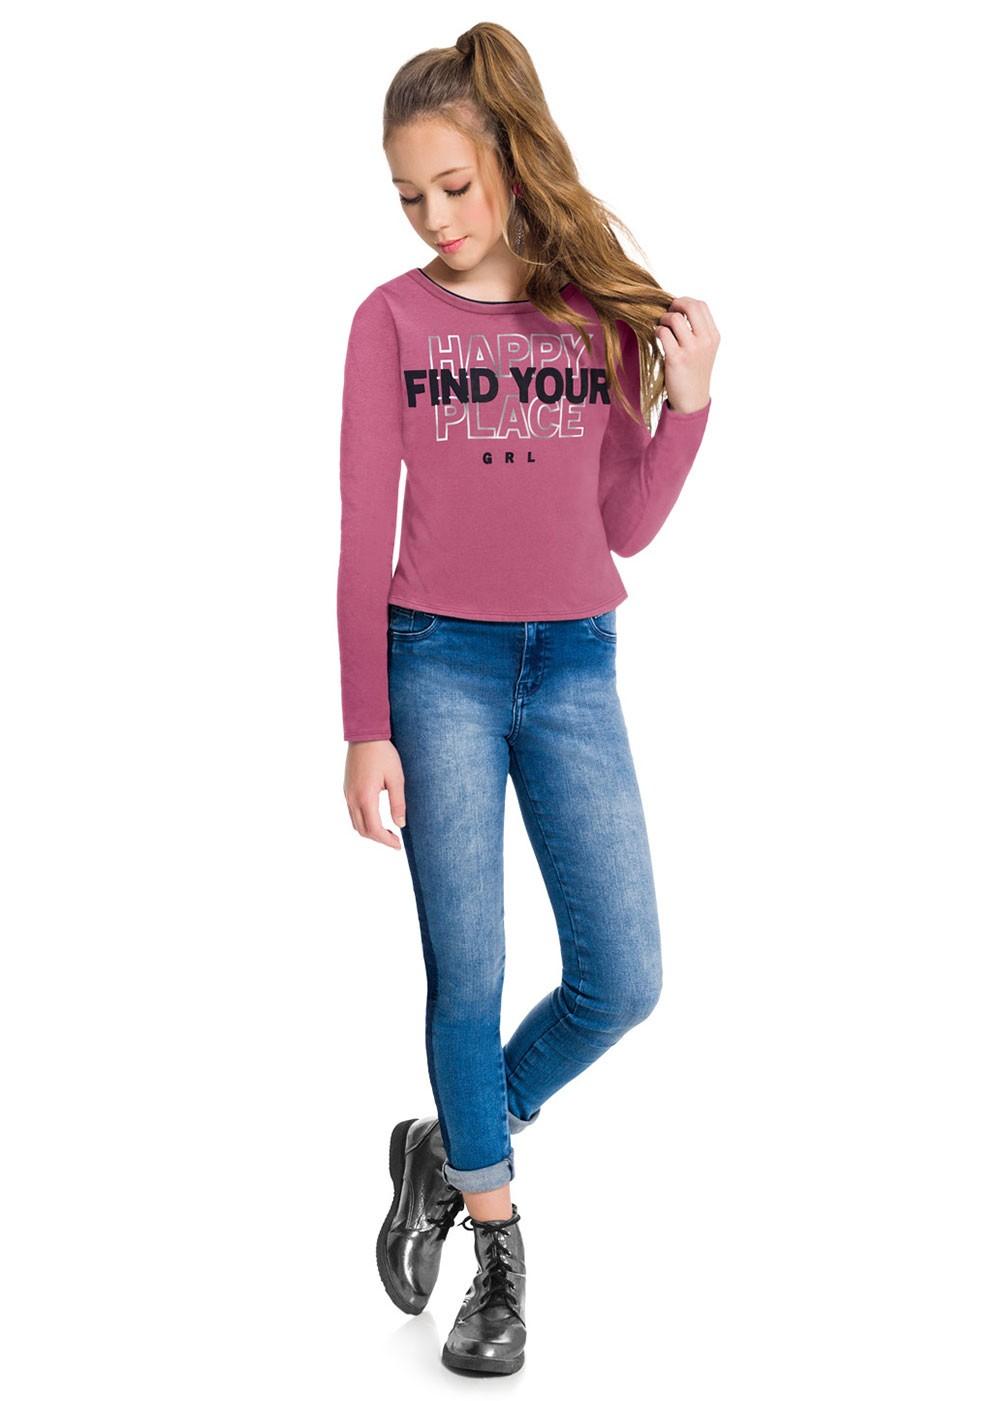 Blusa Infantil Feminina Estampada Rosa Inverno Amora